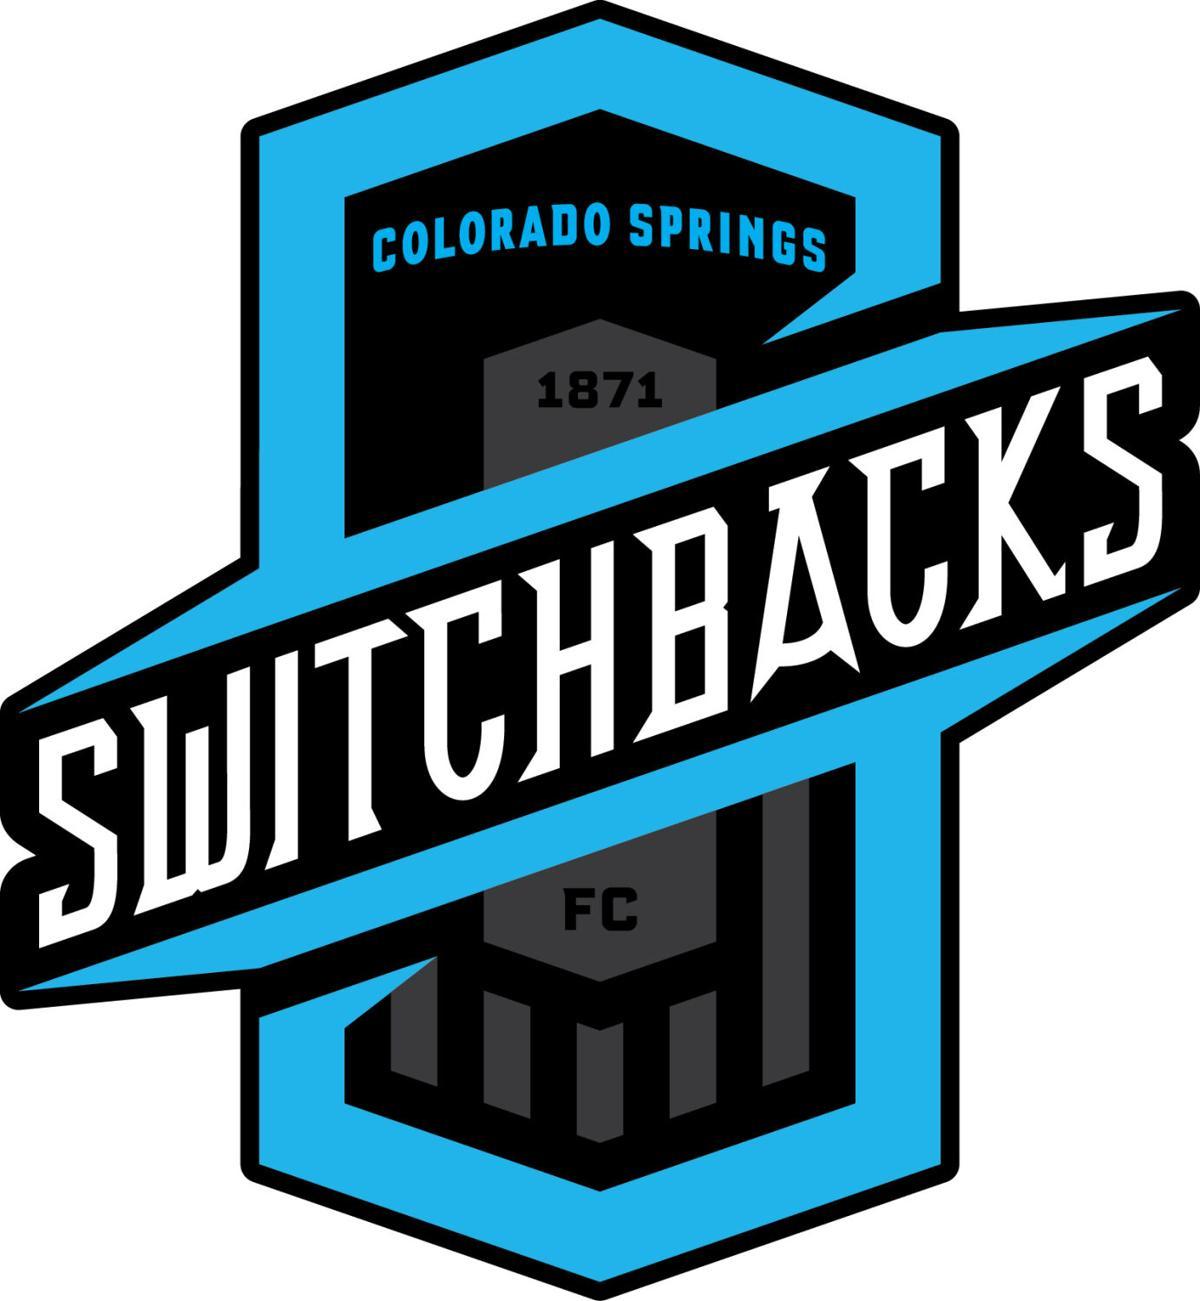 Switchbacks logo